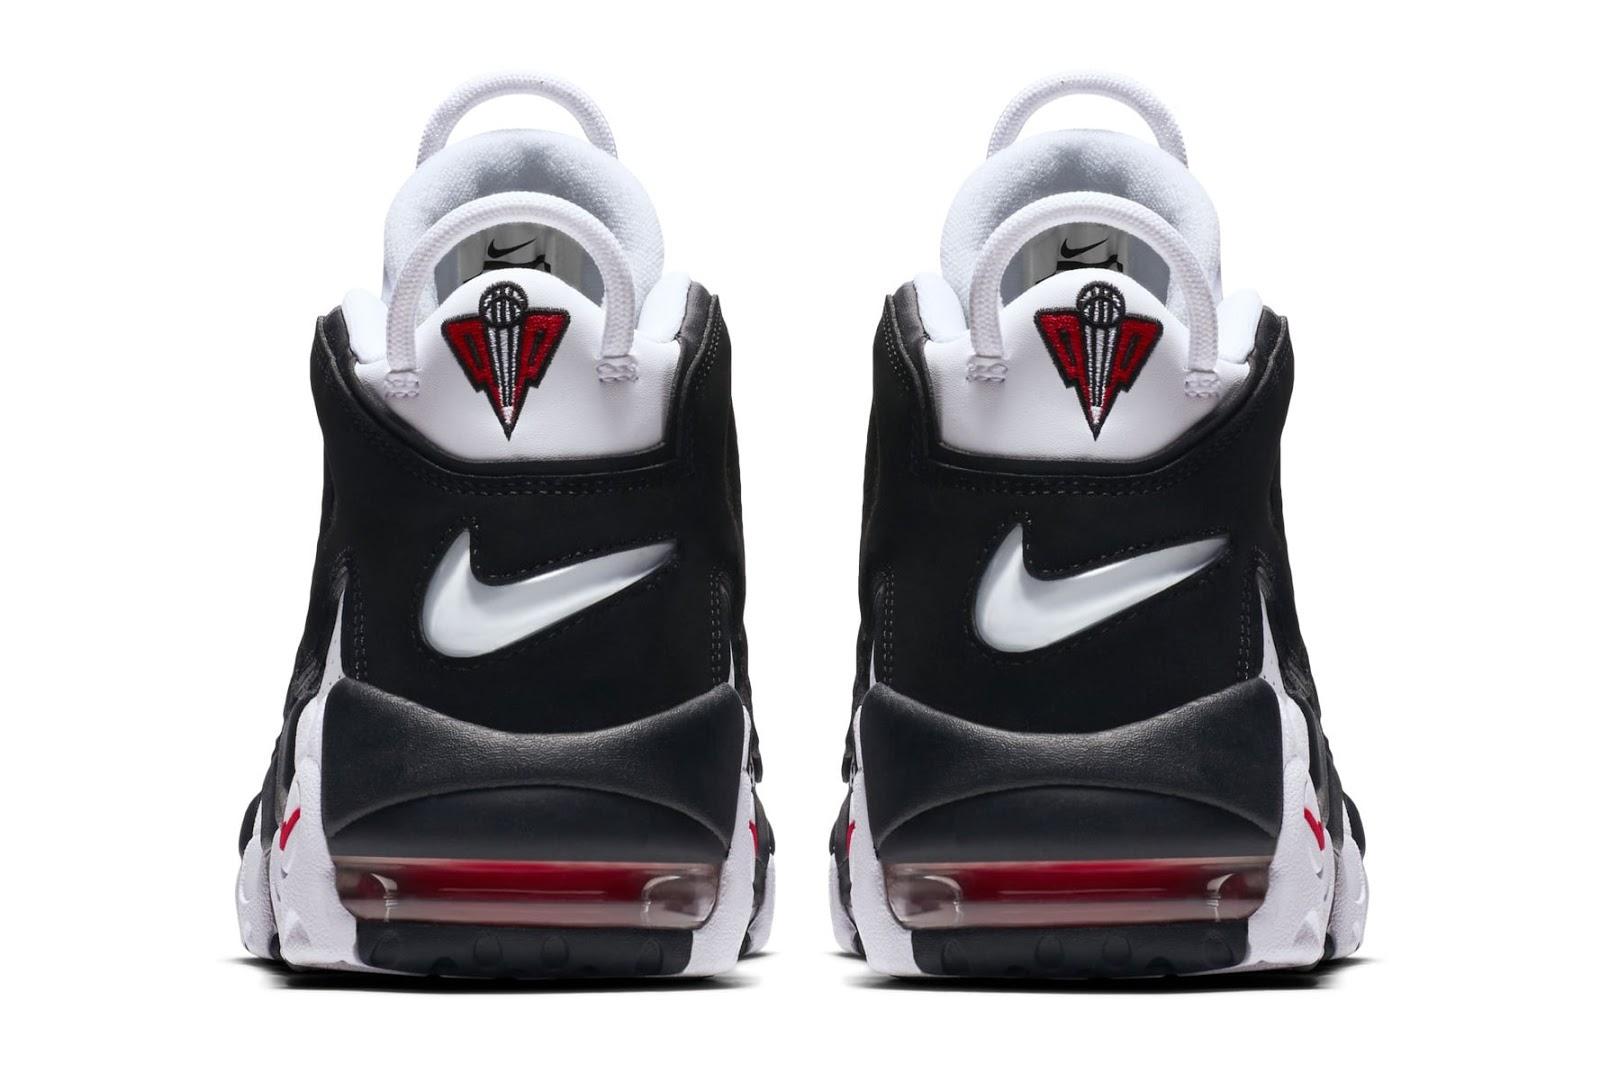 0a7c80ae8b50 Nike Air More Uptempo White Black